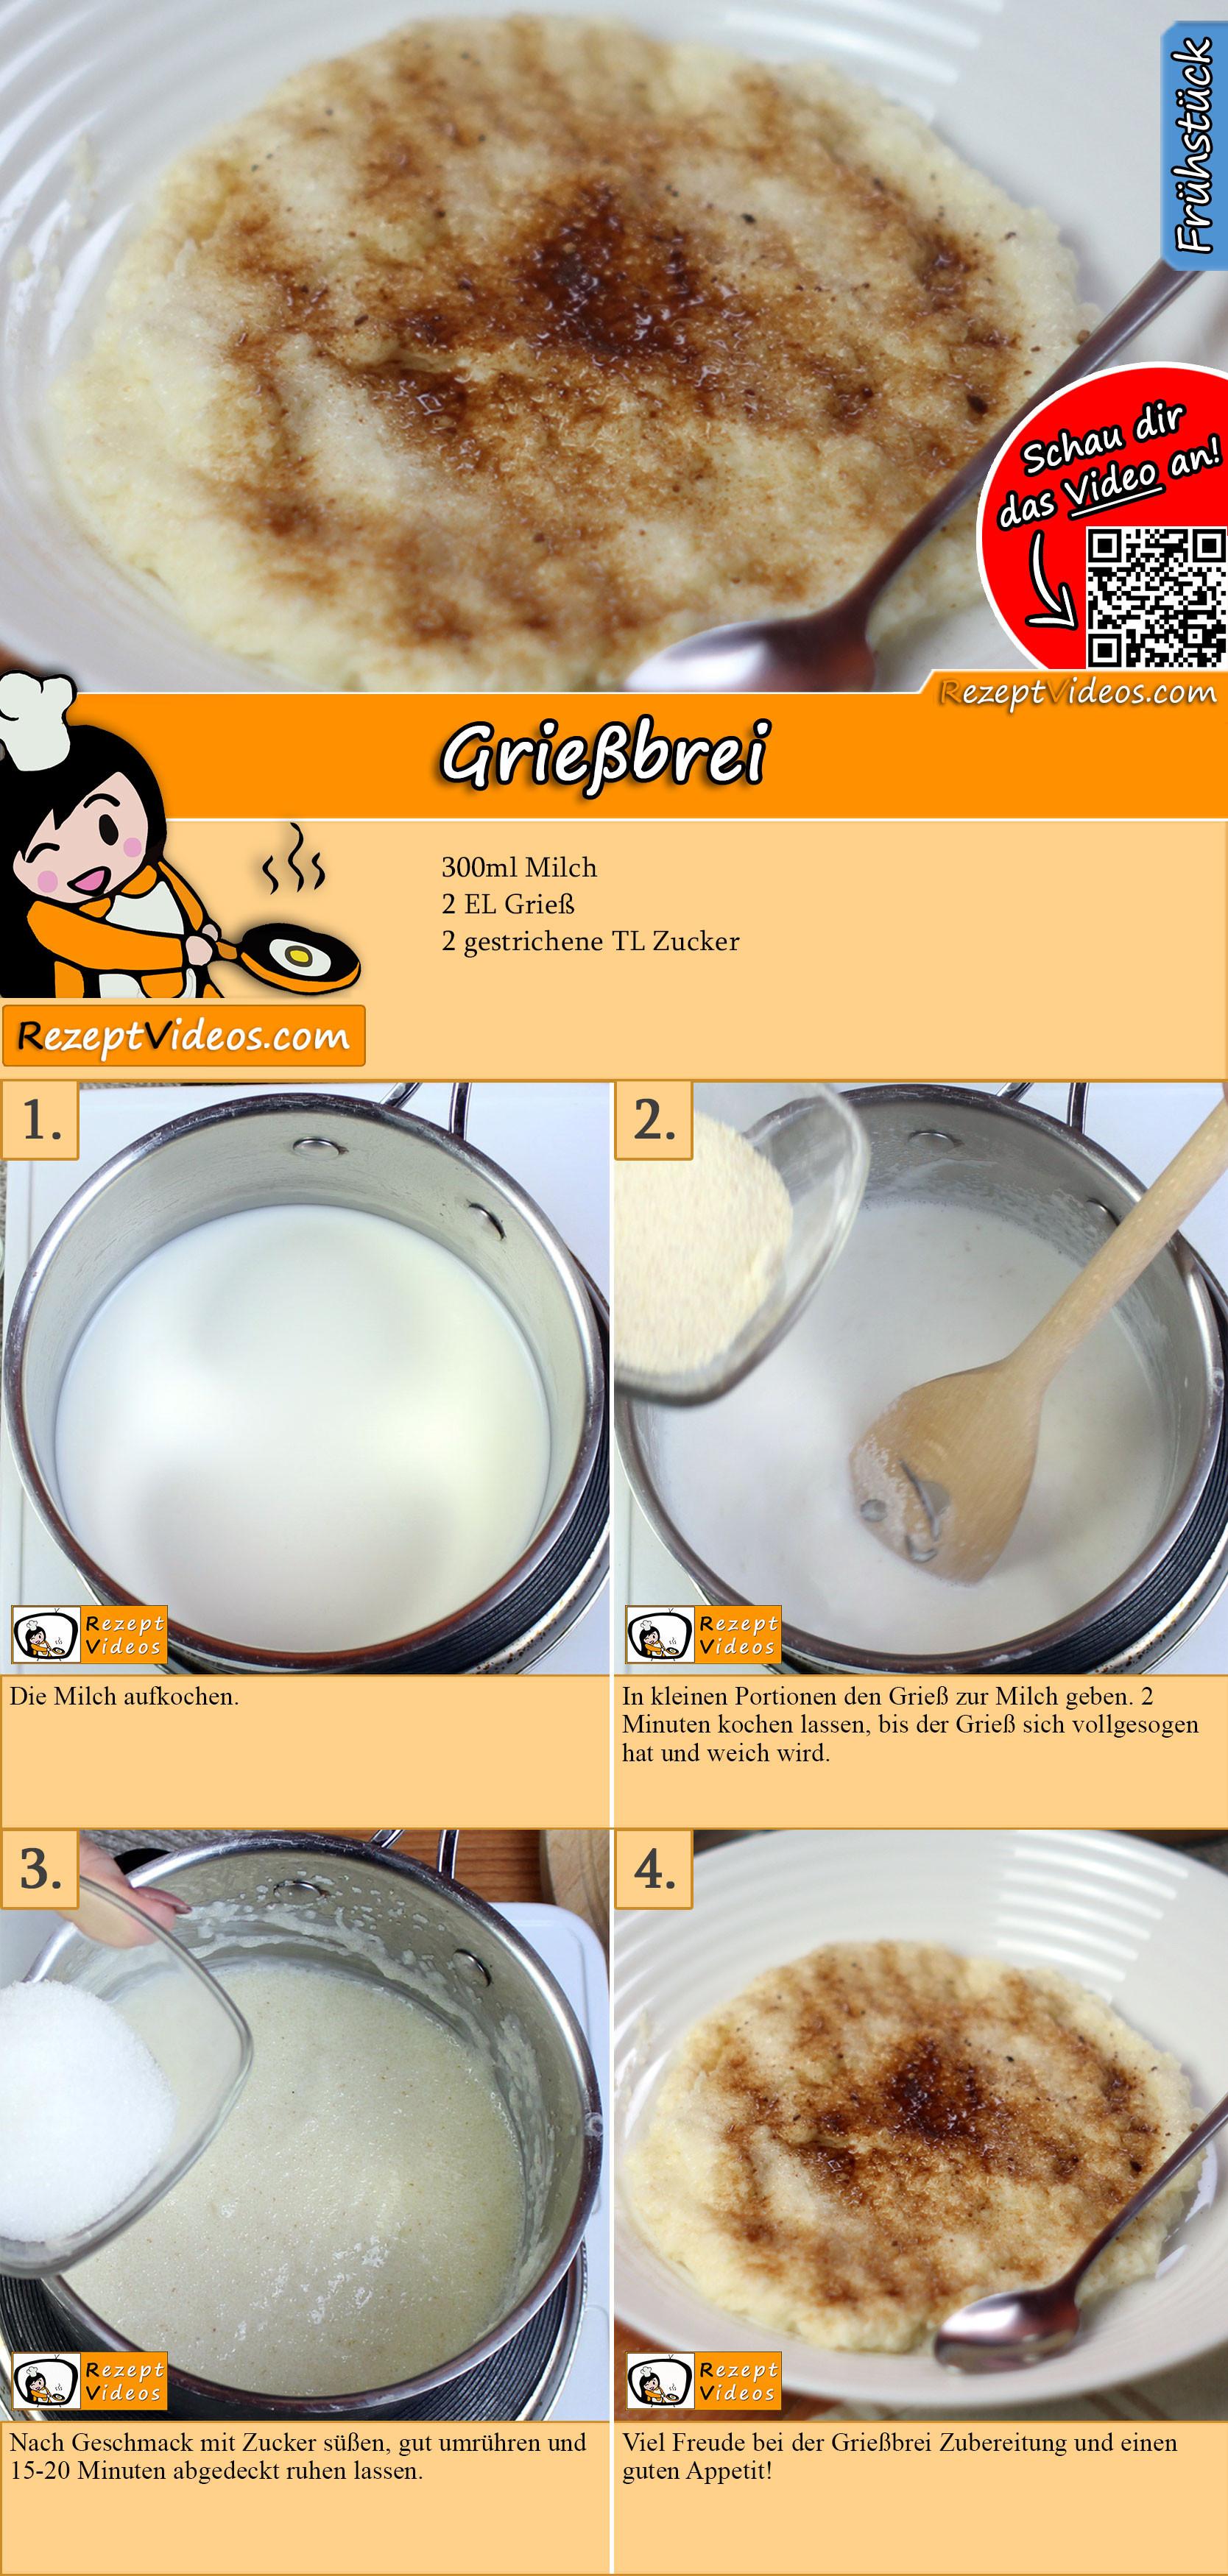 Grießbrei Rezept mit Video